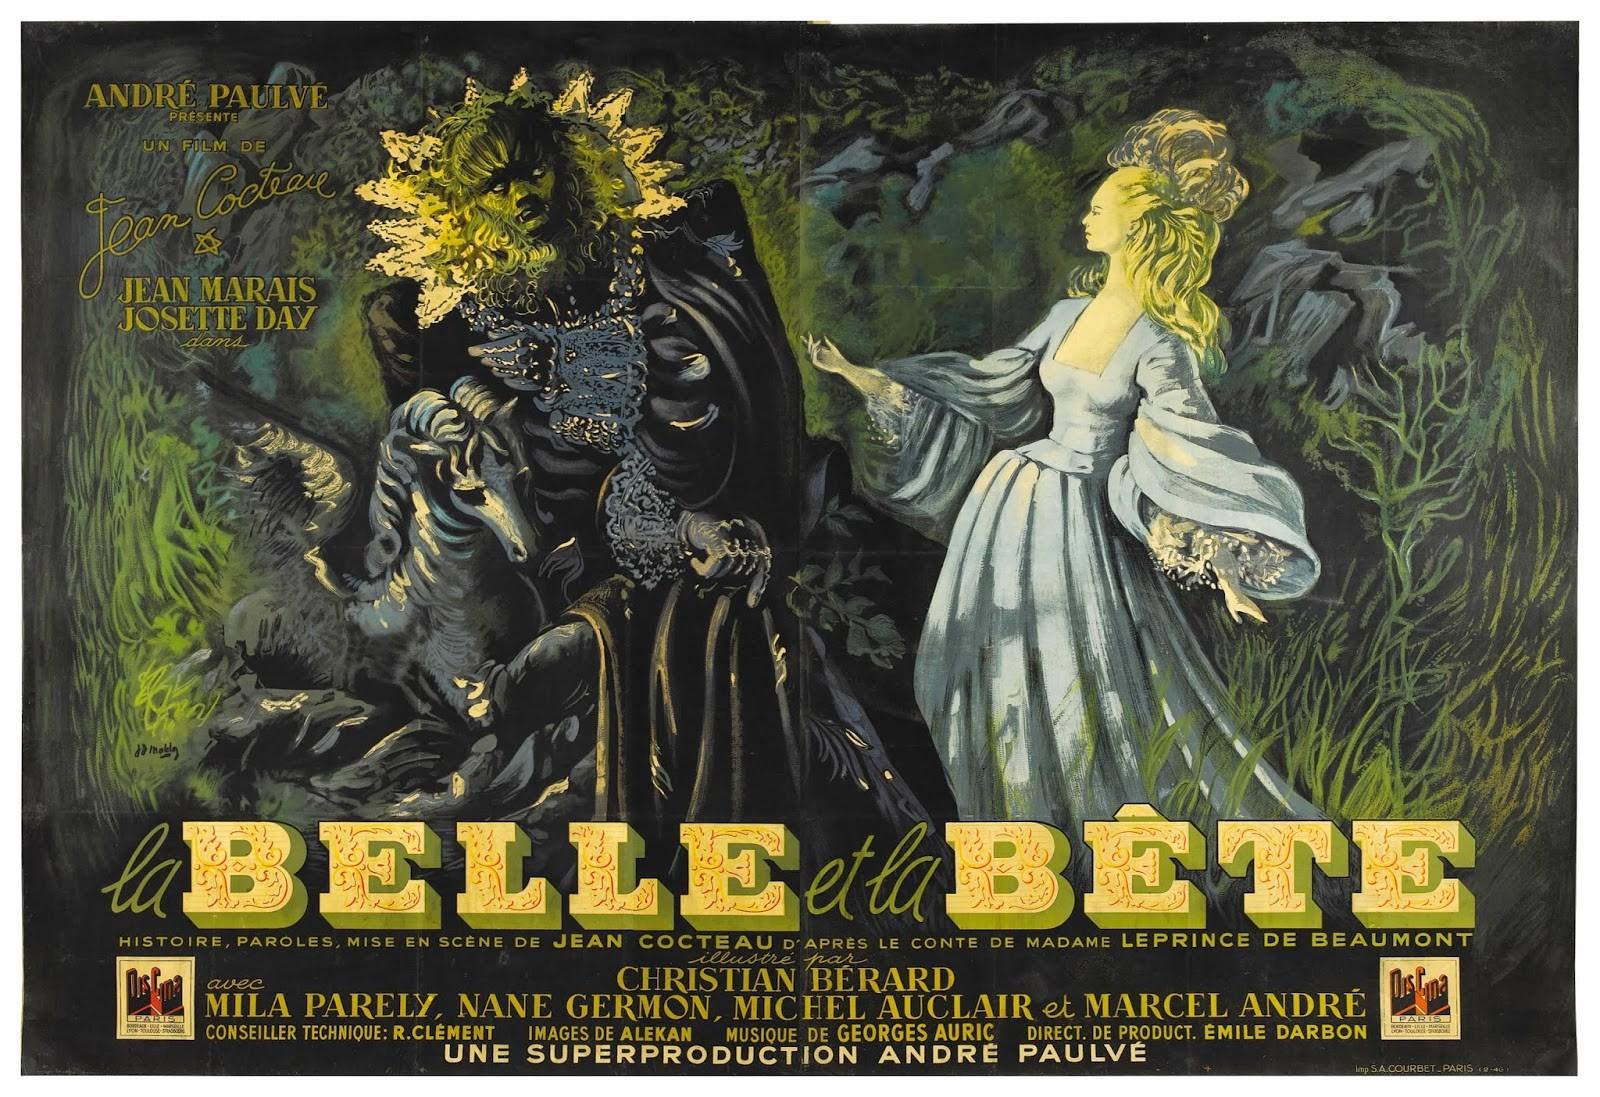 General 1600x1097 Film posters La Belle et la Bête Beauty and the Beast movie poster